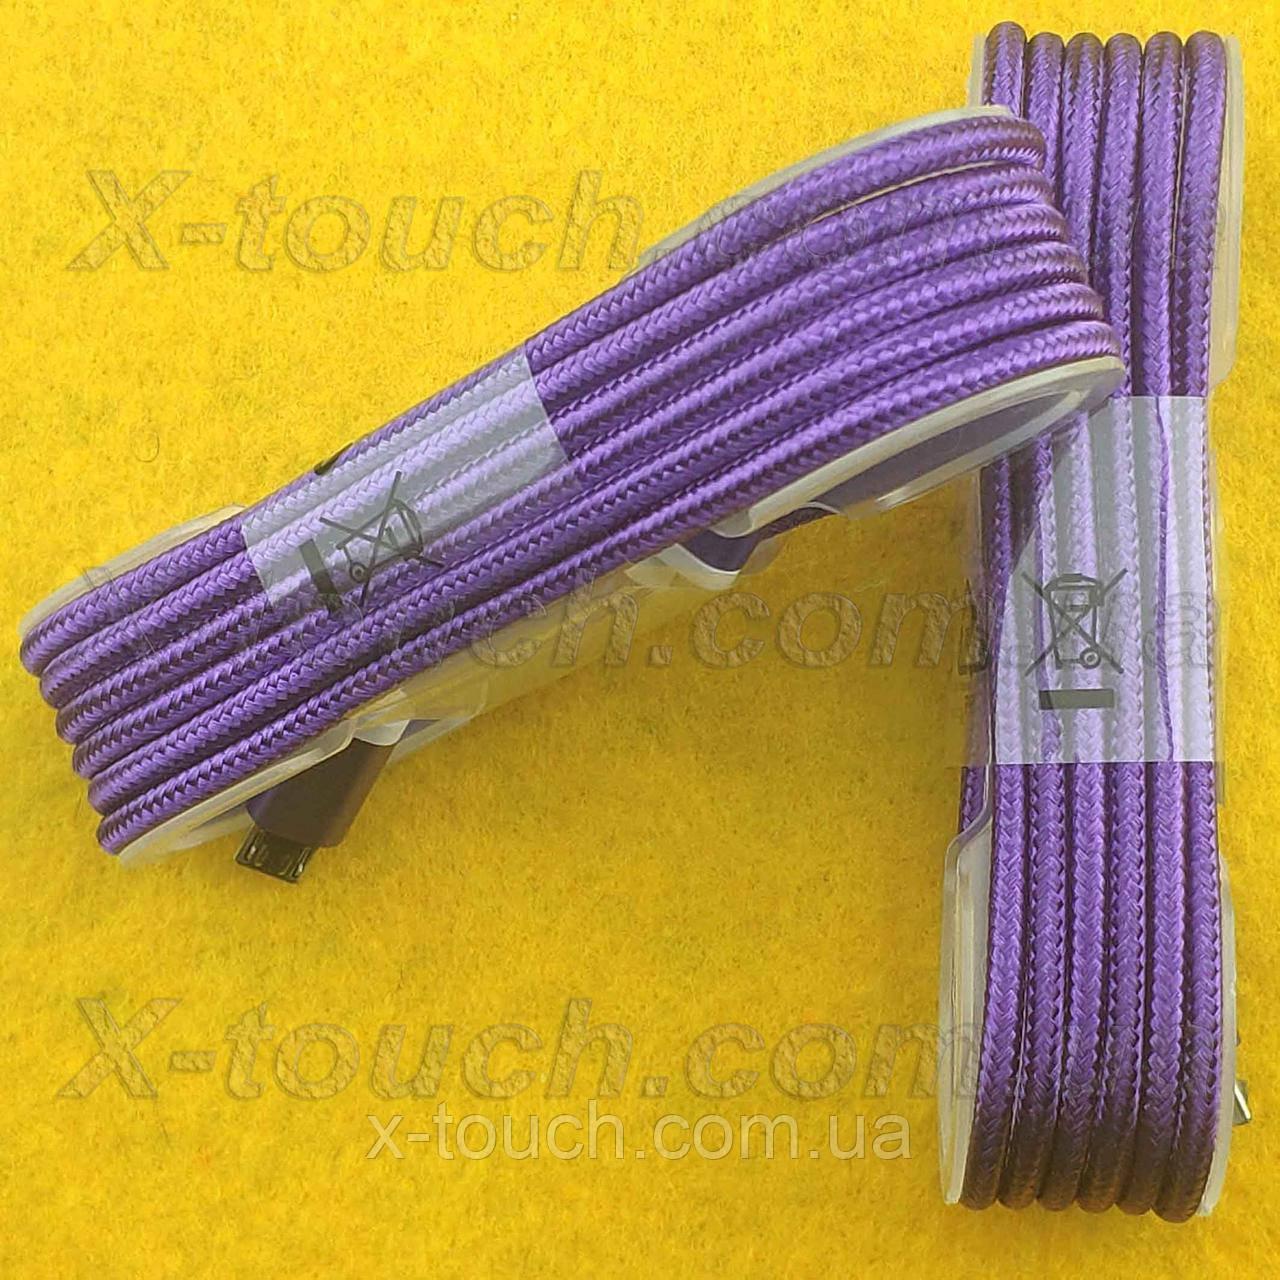 USB - Micro USB кабель в тканевой оболочке 1.5 м, Шнур micro usb 2.0 для LG ( цвет фиолетовый)